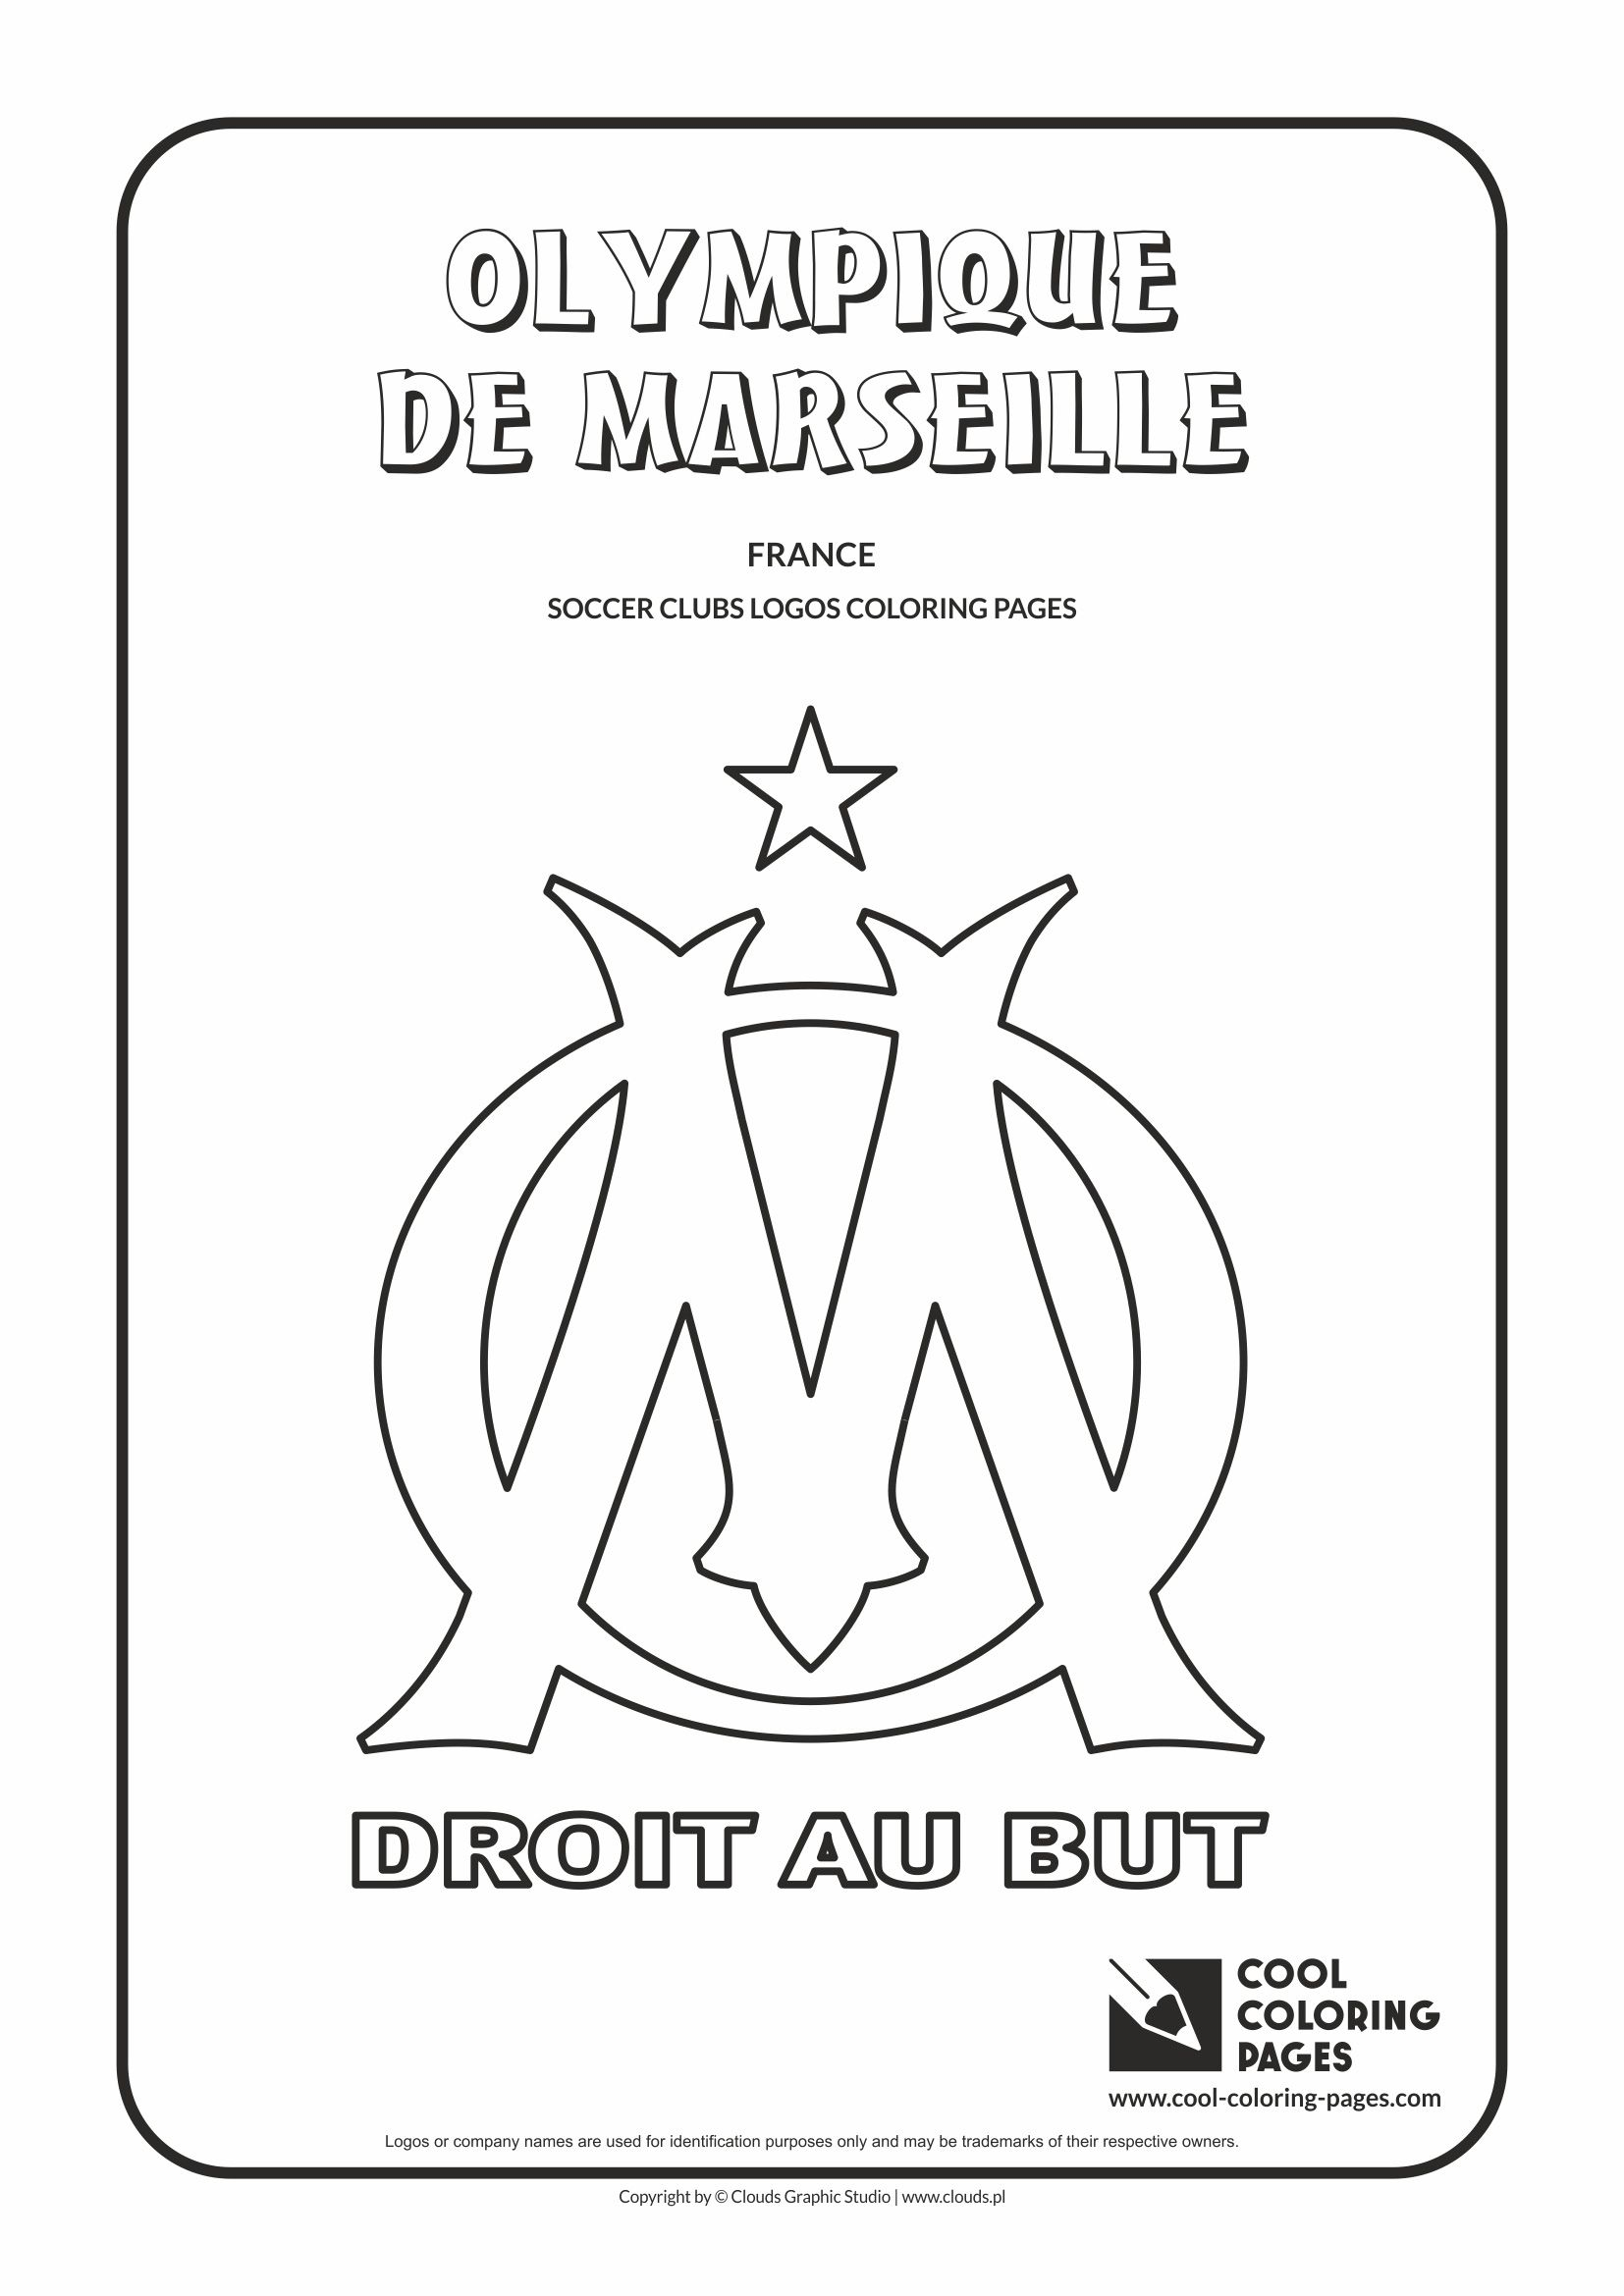 Olympique De Marseille Logo Coloring Coloring Page With Olympique Marsylia Cool Coloring Pages Flag Coloring Pages Cool Coloring Pages Coloring Pages